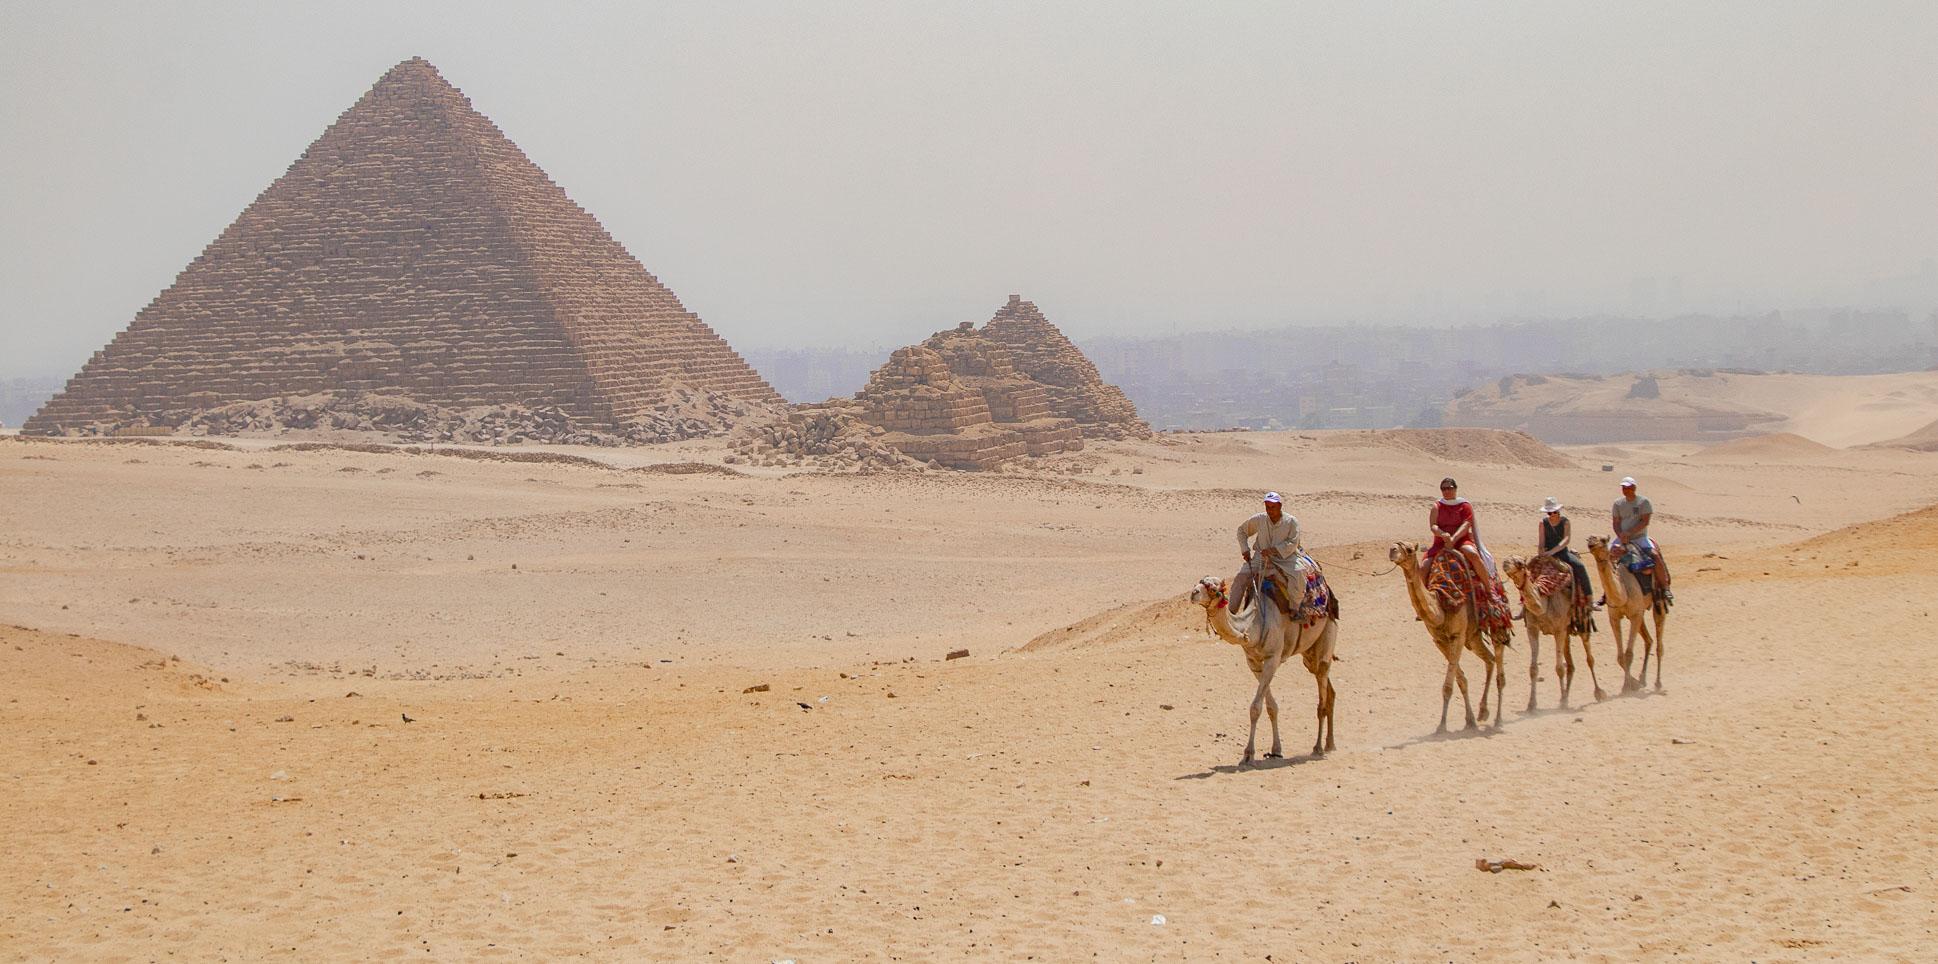 viajes a Egipto baratos